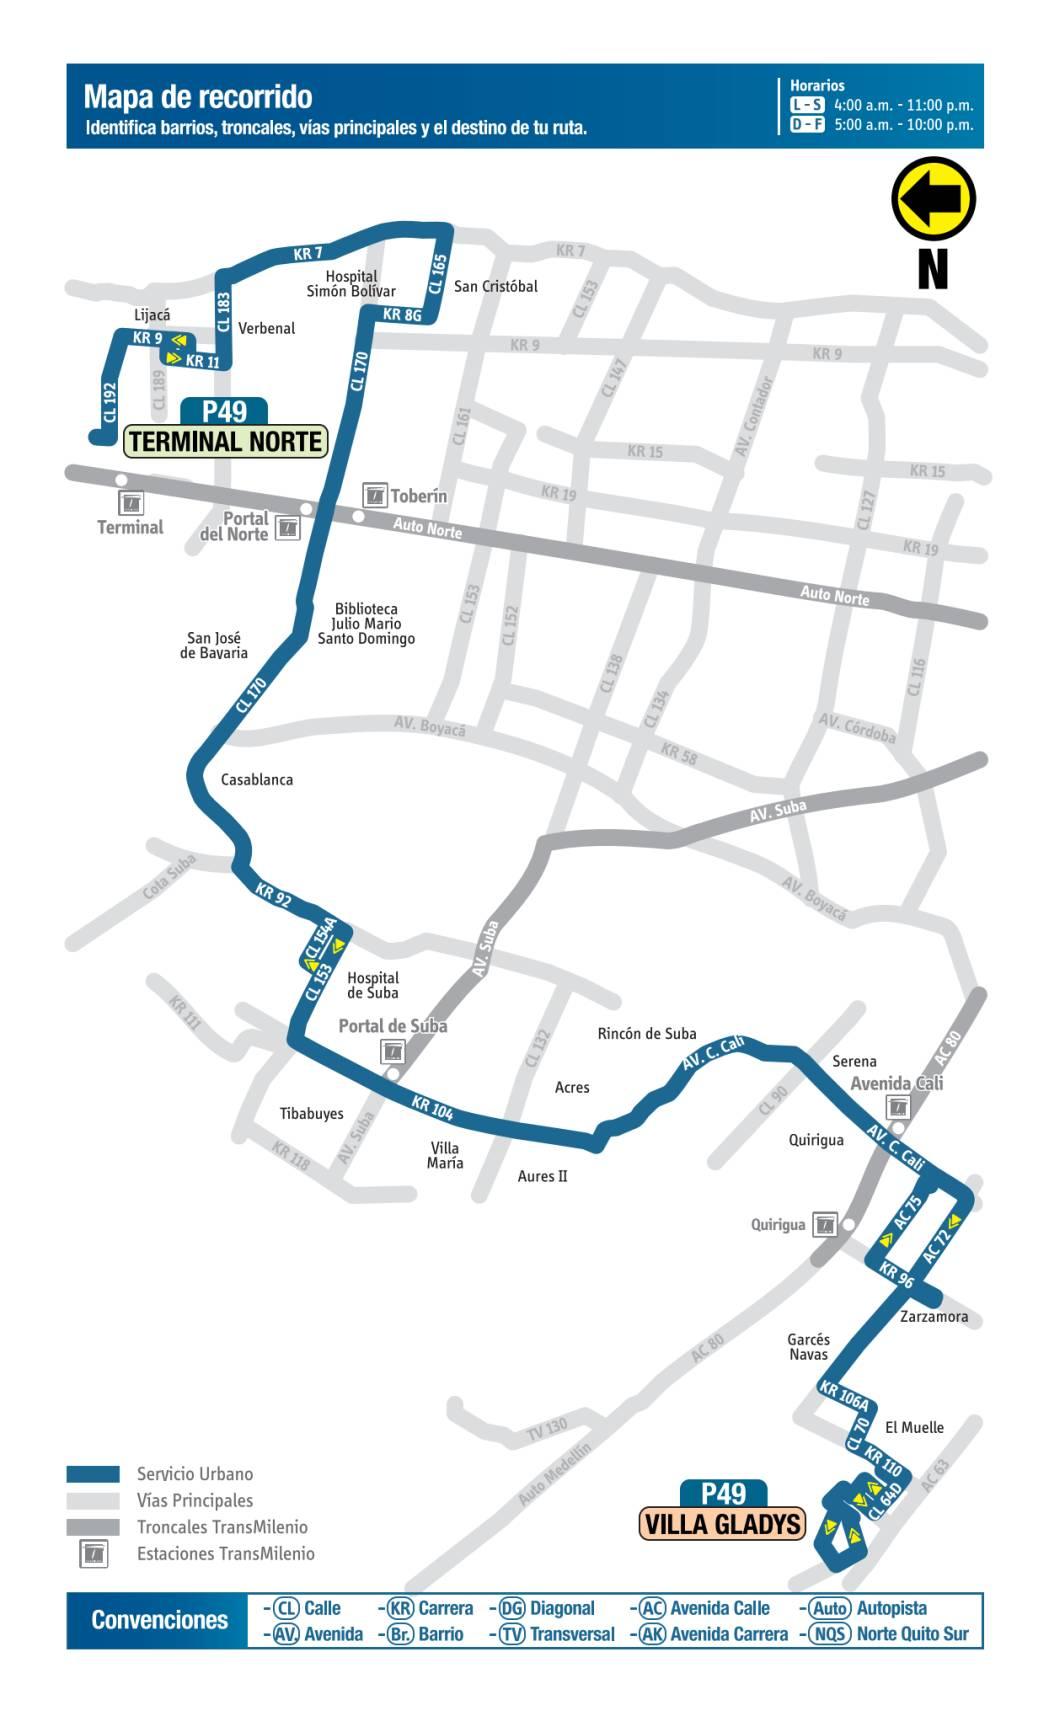 P49 Villa Gladys - Terminal Norte, mapa bus urbano Bogotá